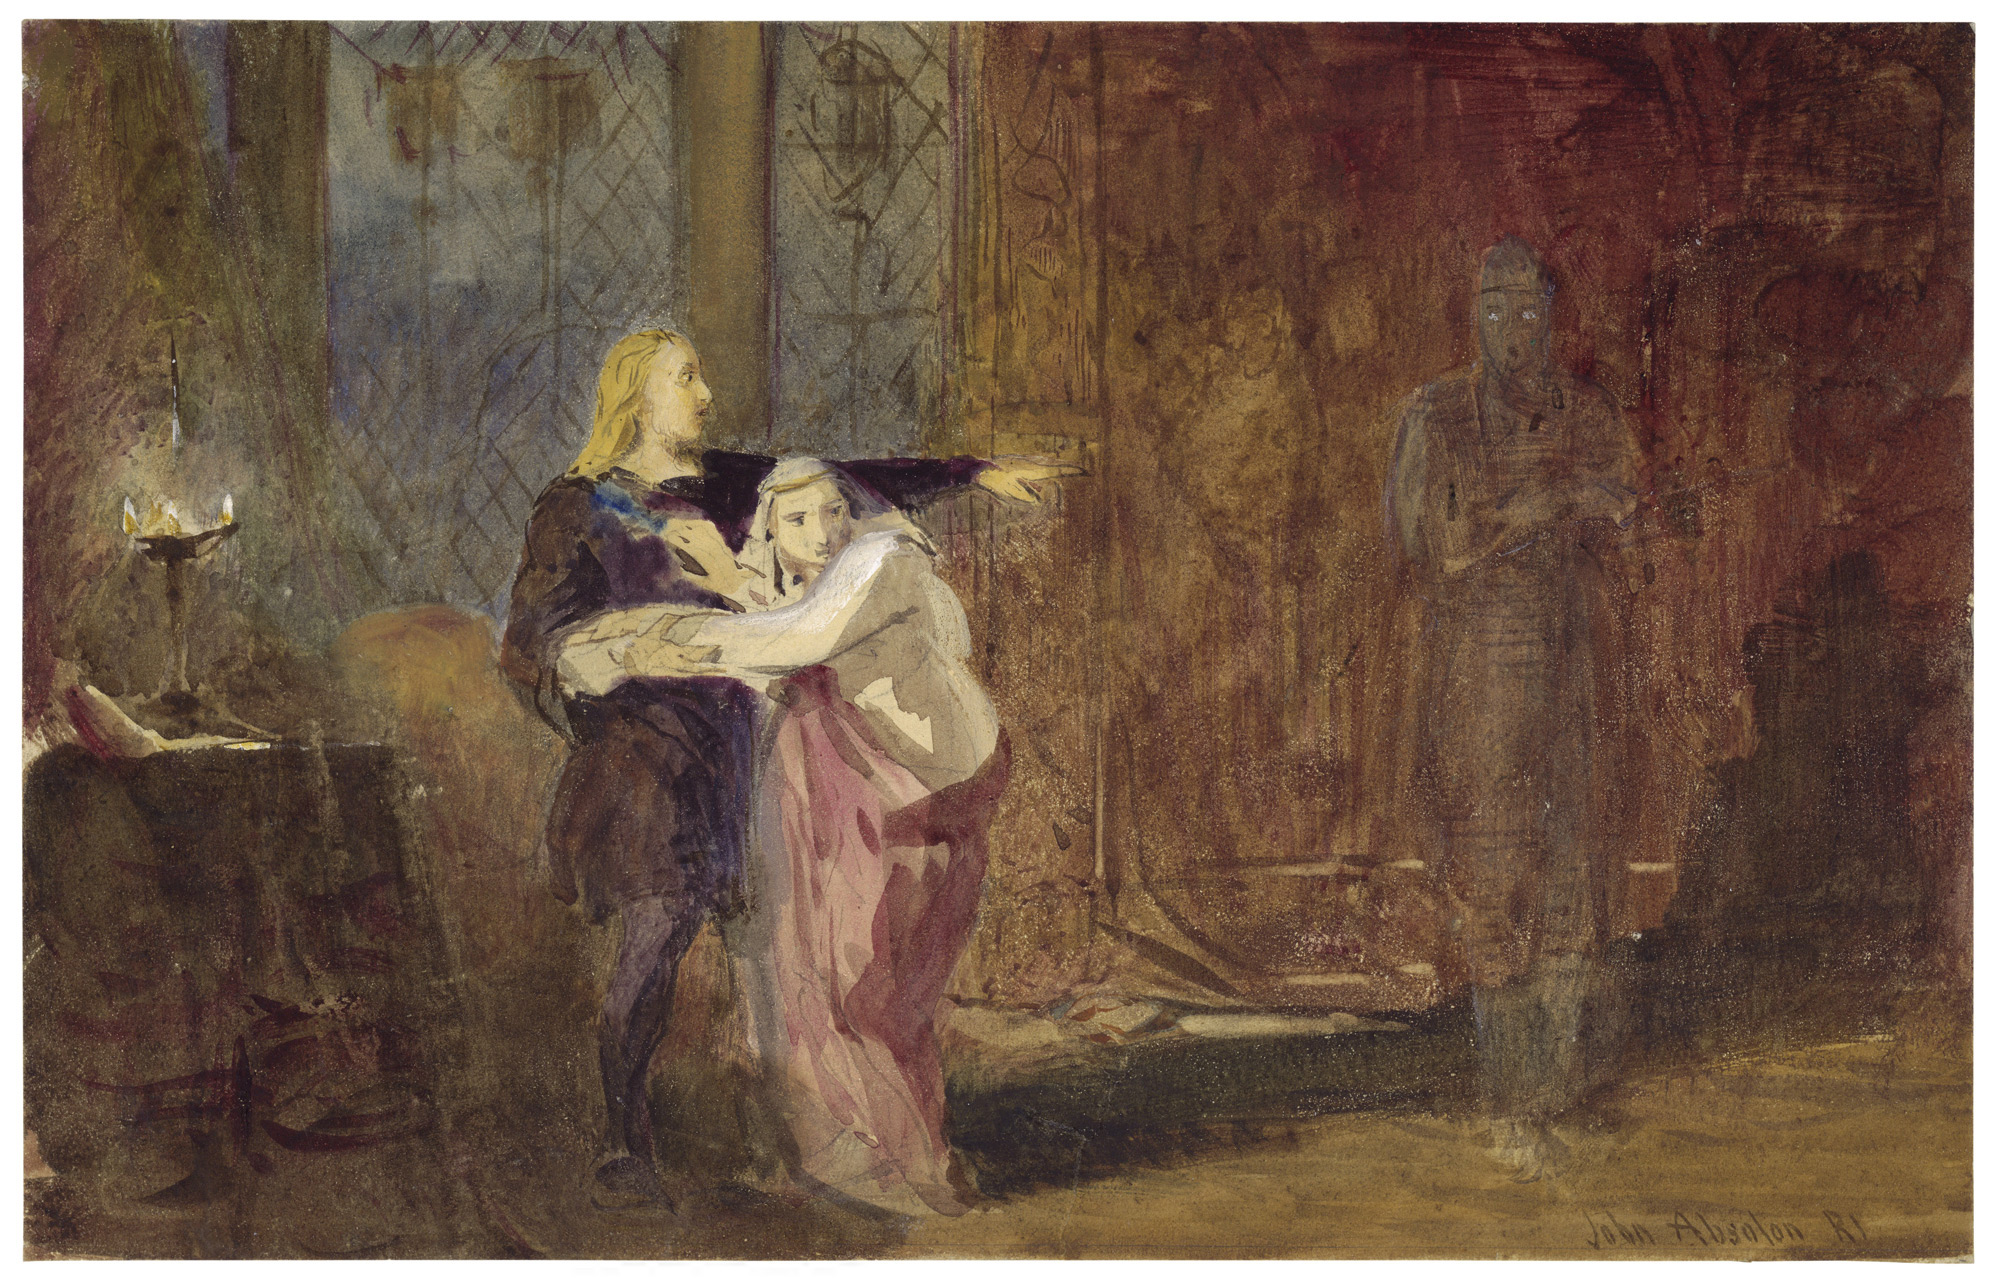 Edmund Kean as Hamlet with ghost